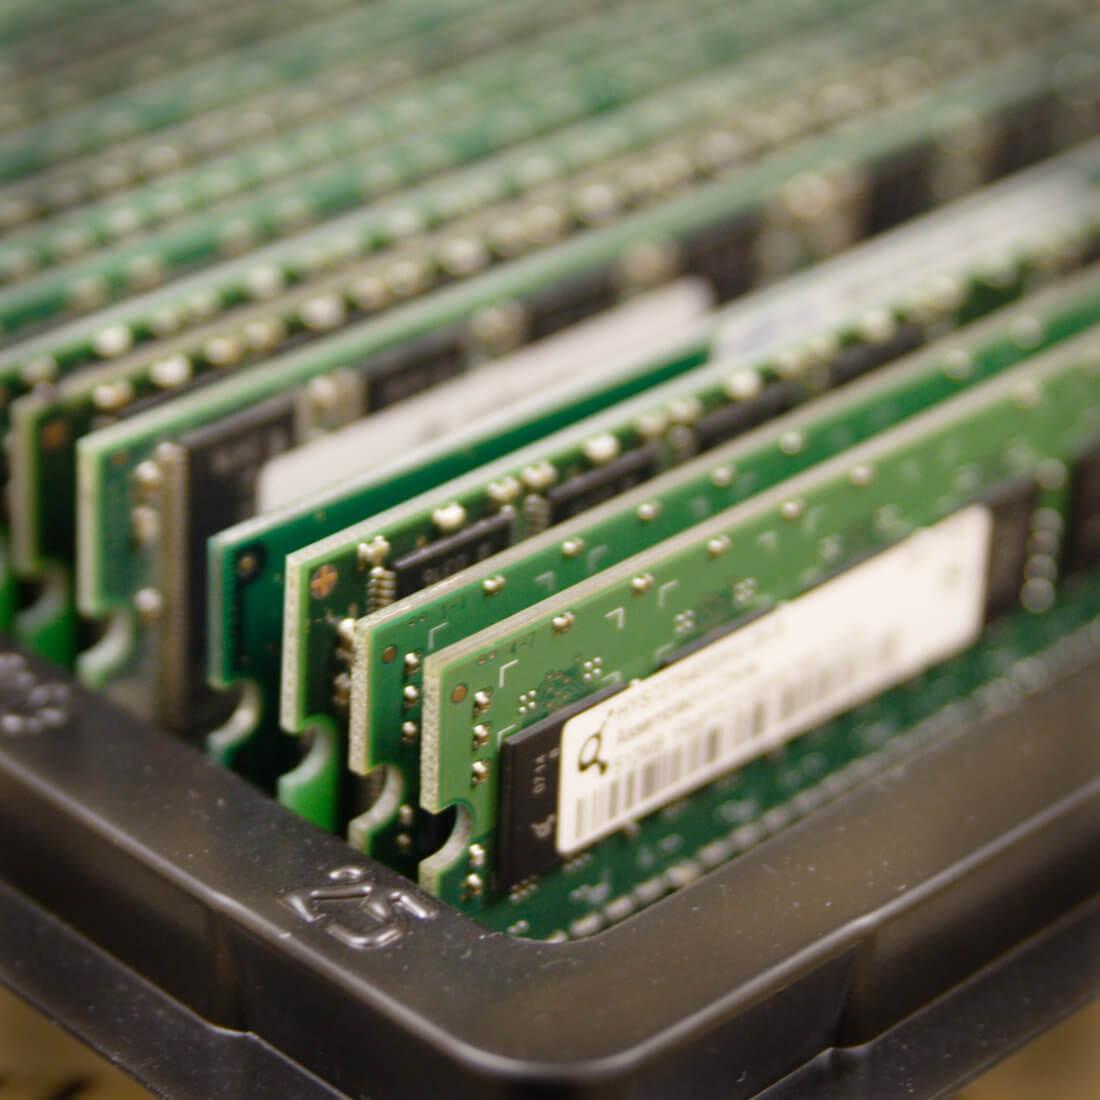 замена оперативной памяти на компьютере